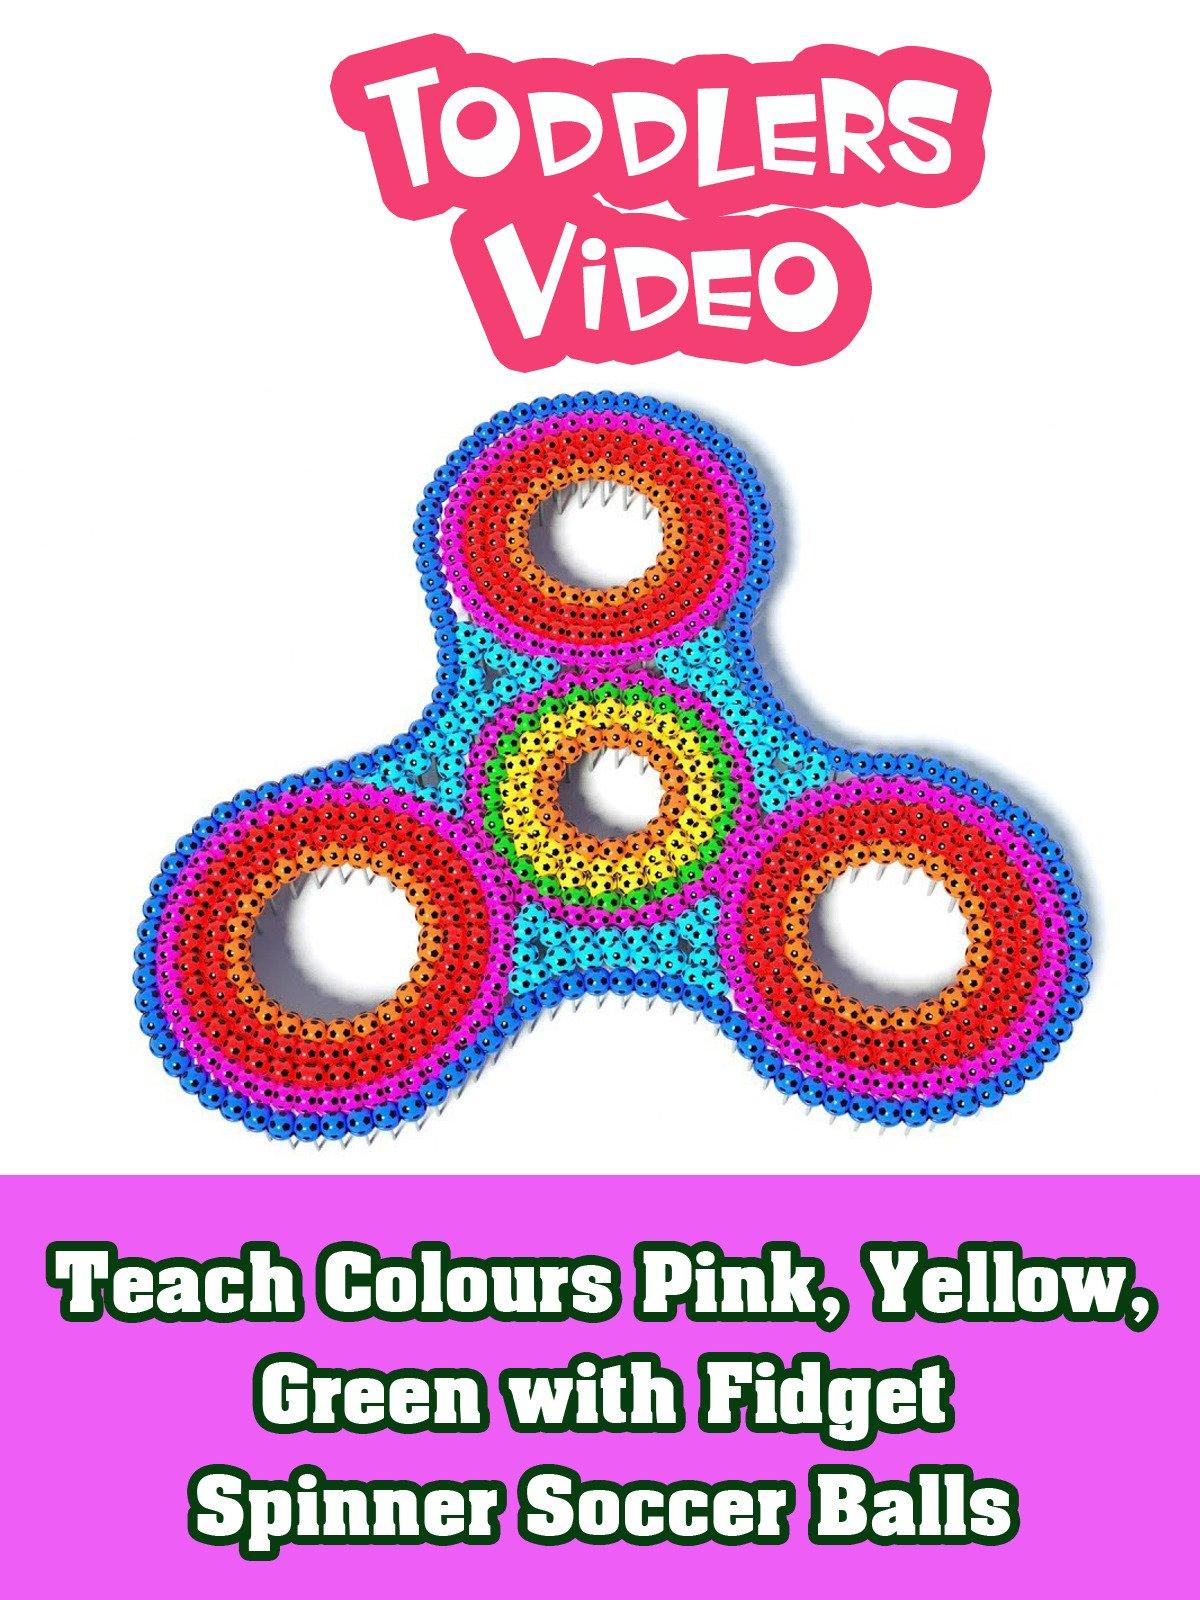 Teach Colours Pink, Yellow, Green with Fidget Spinner Soccer Balls